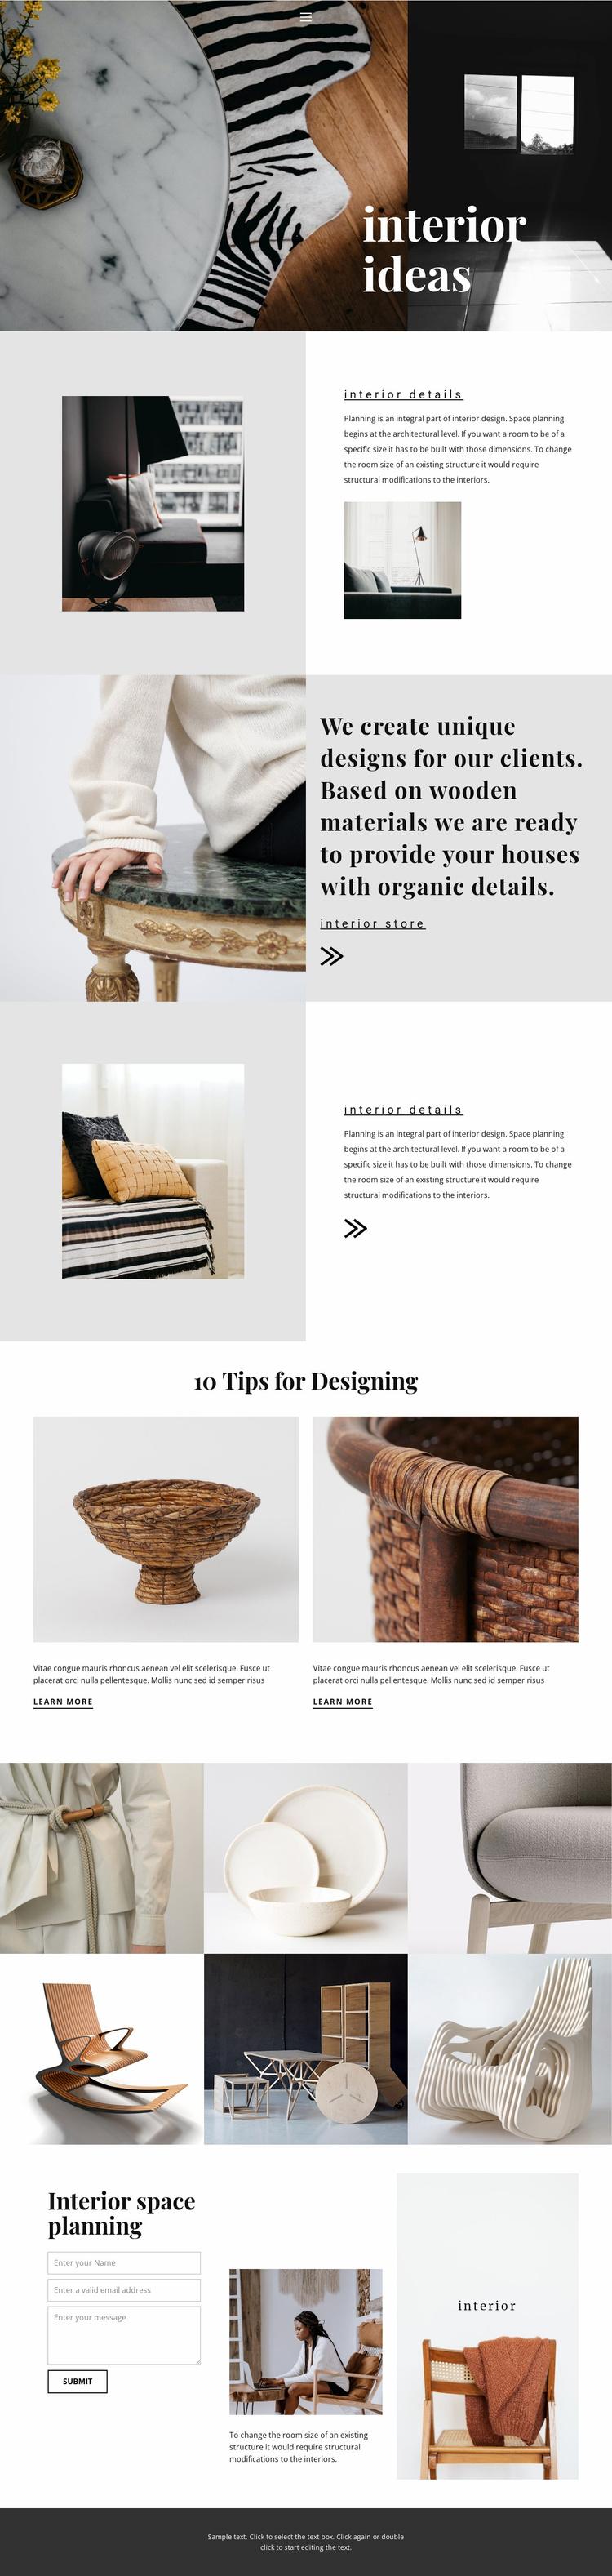 New interior ideas Website Template